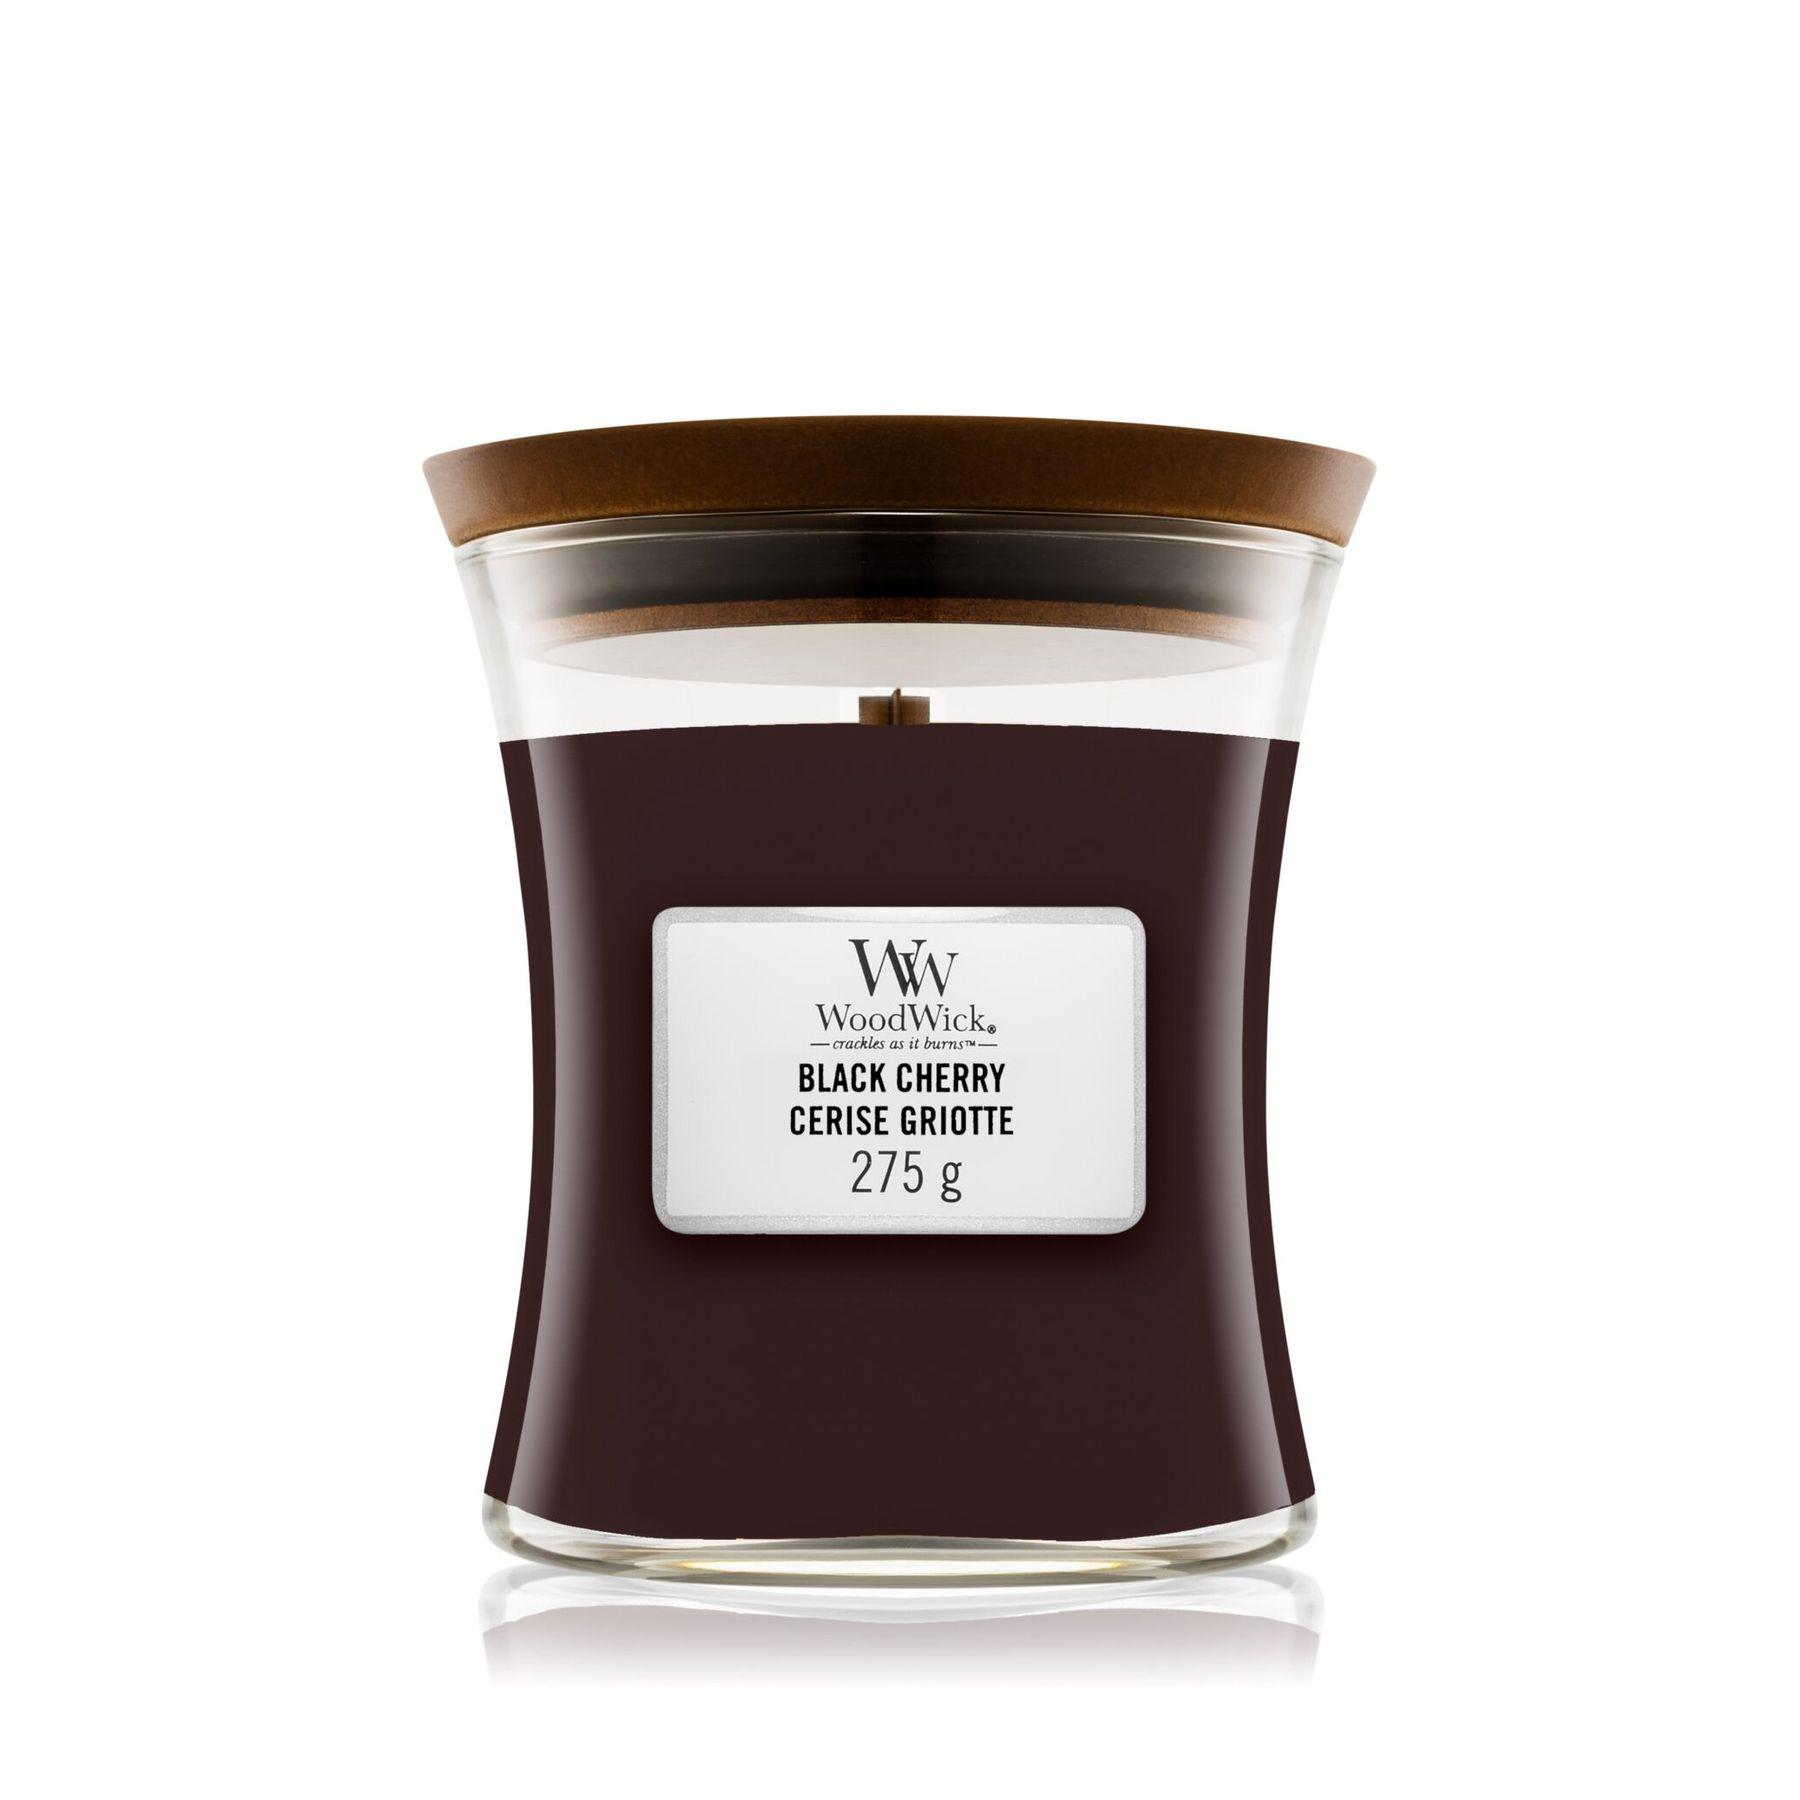 Свеча Medium Black Cherry Wood Wick Англия 275 г(р) — фото №1